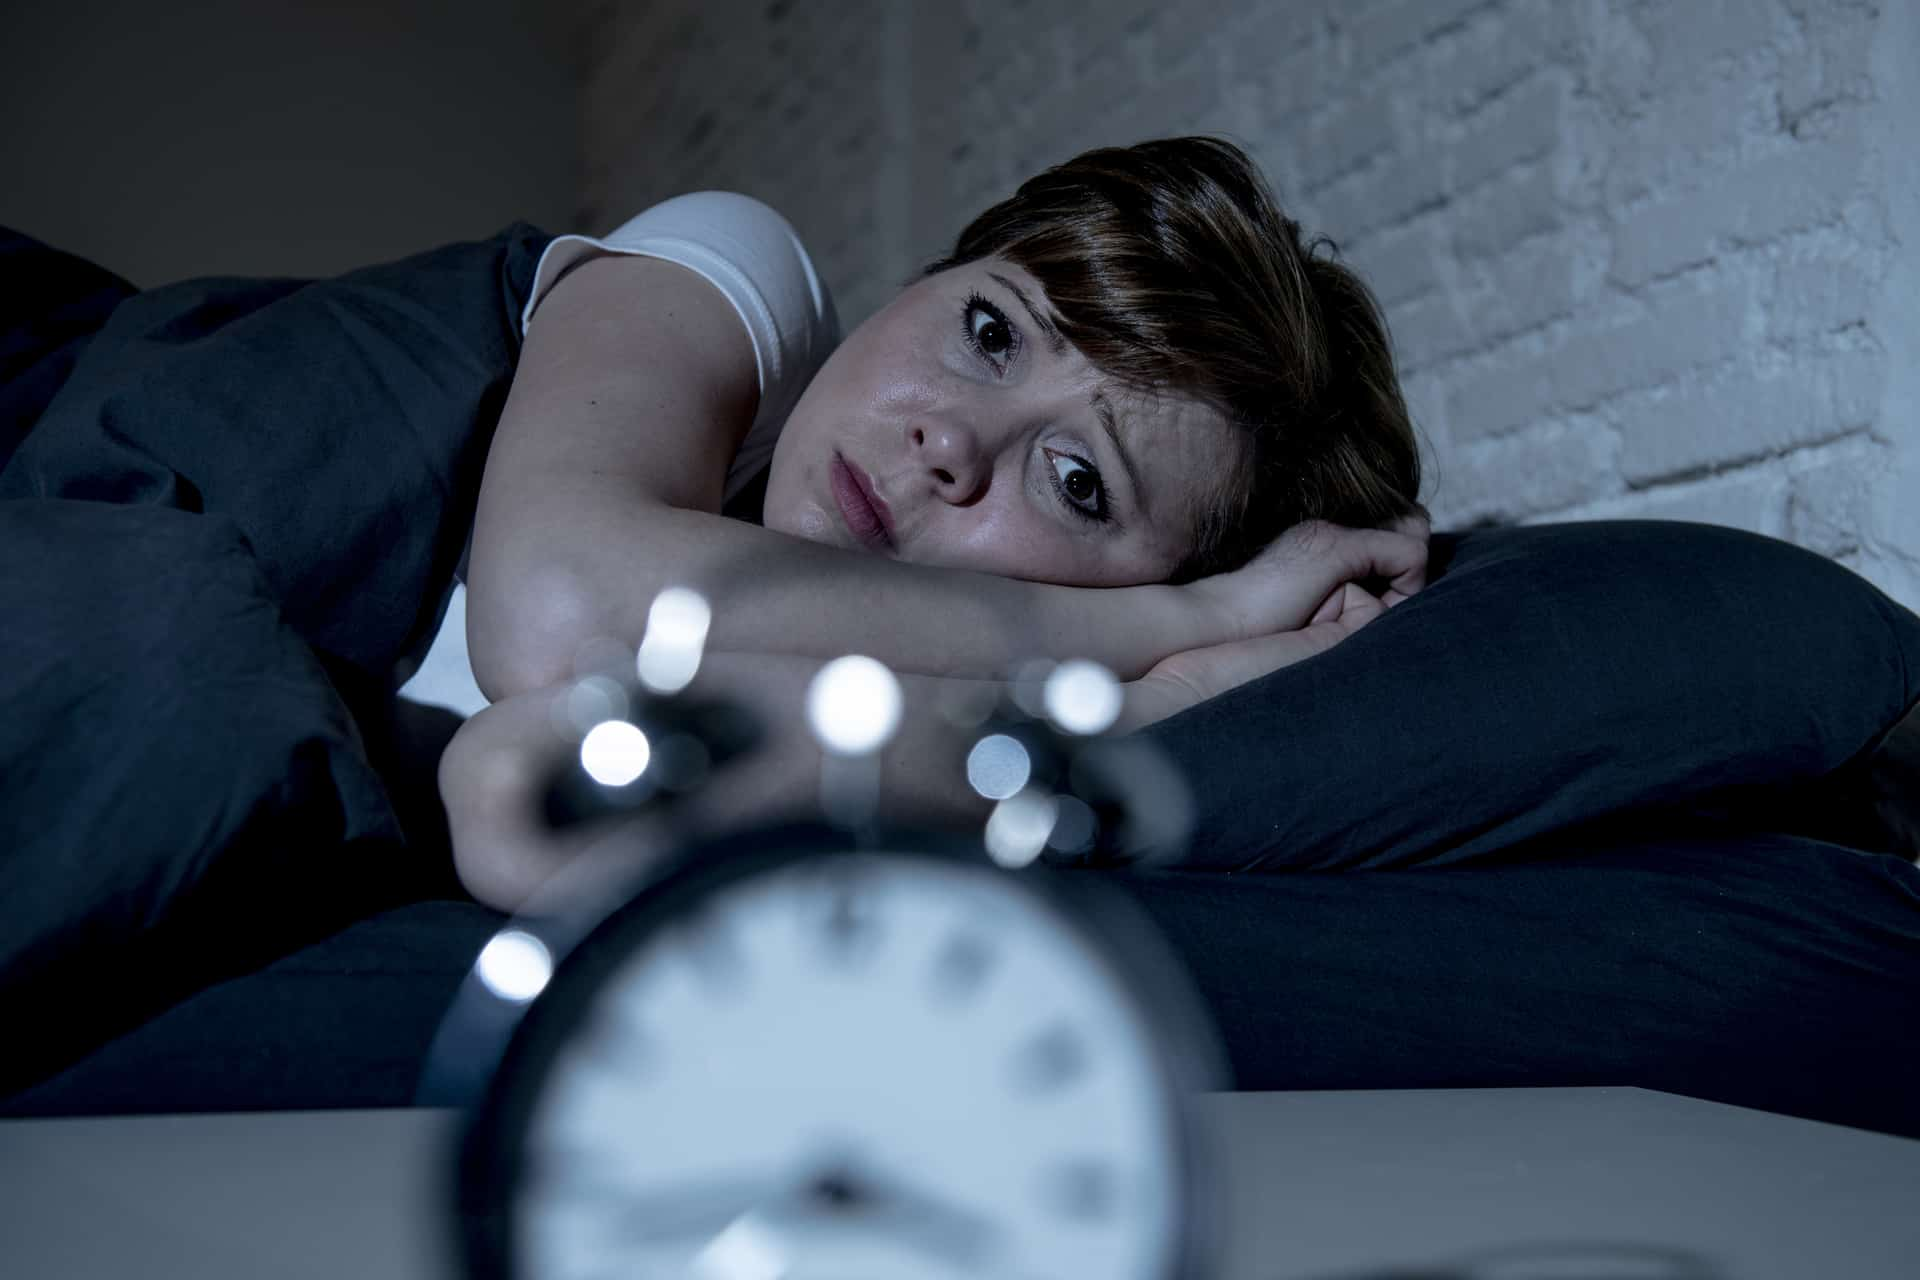 sleep-deprivation-side-effects.jpg